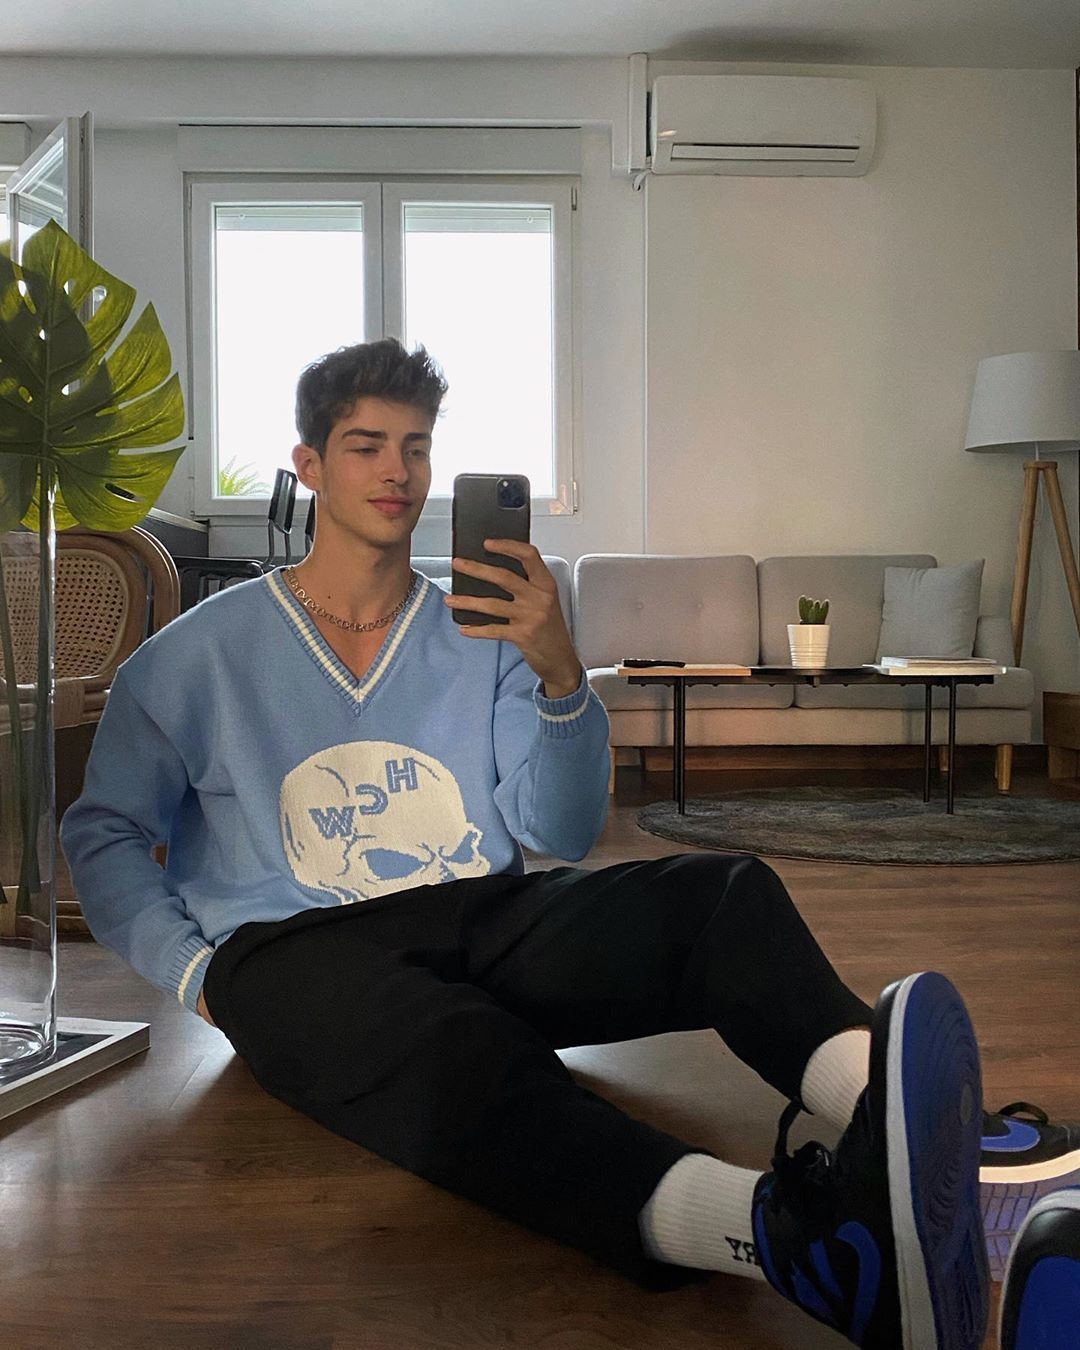 AMI Alexandre Mattiussi 2018SS | Stylish mens outfits